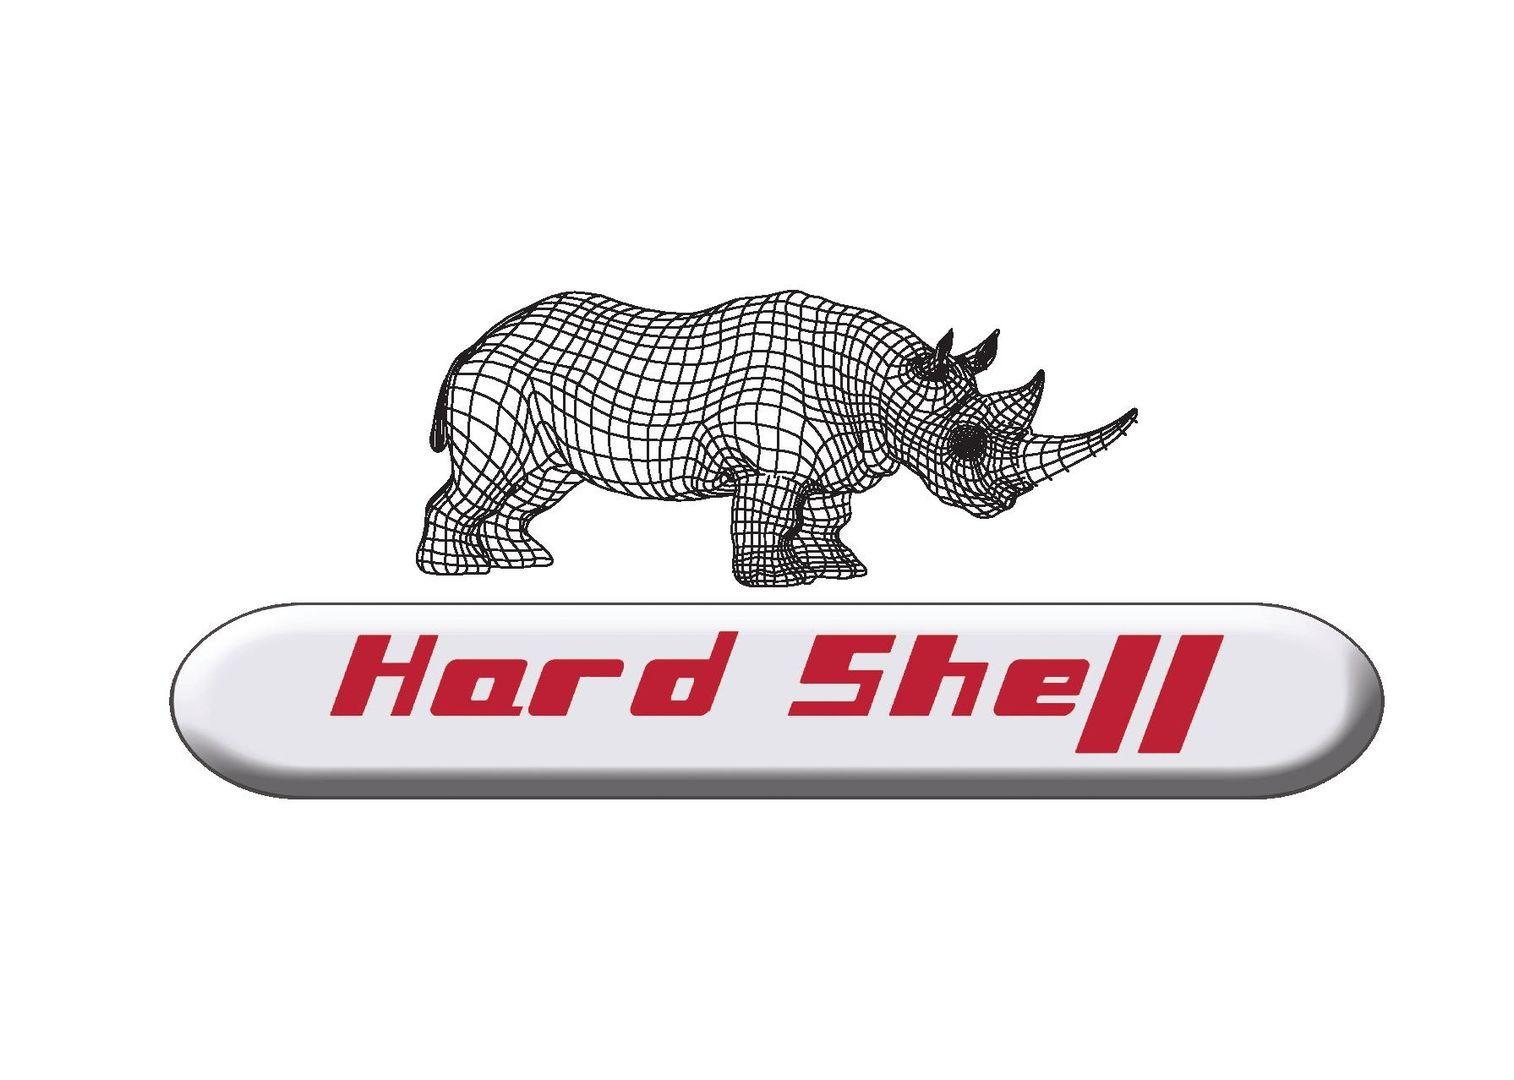 Winter Turf Vest Manufacturer and Supplier- Hard Shell